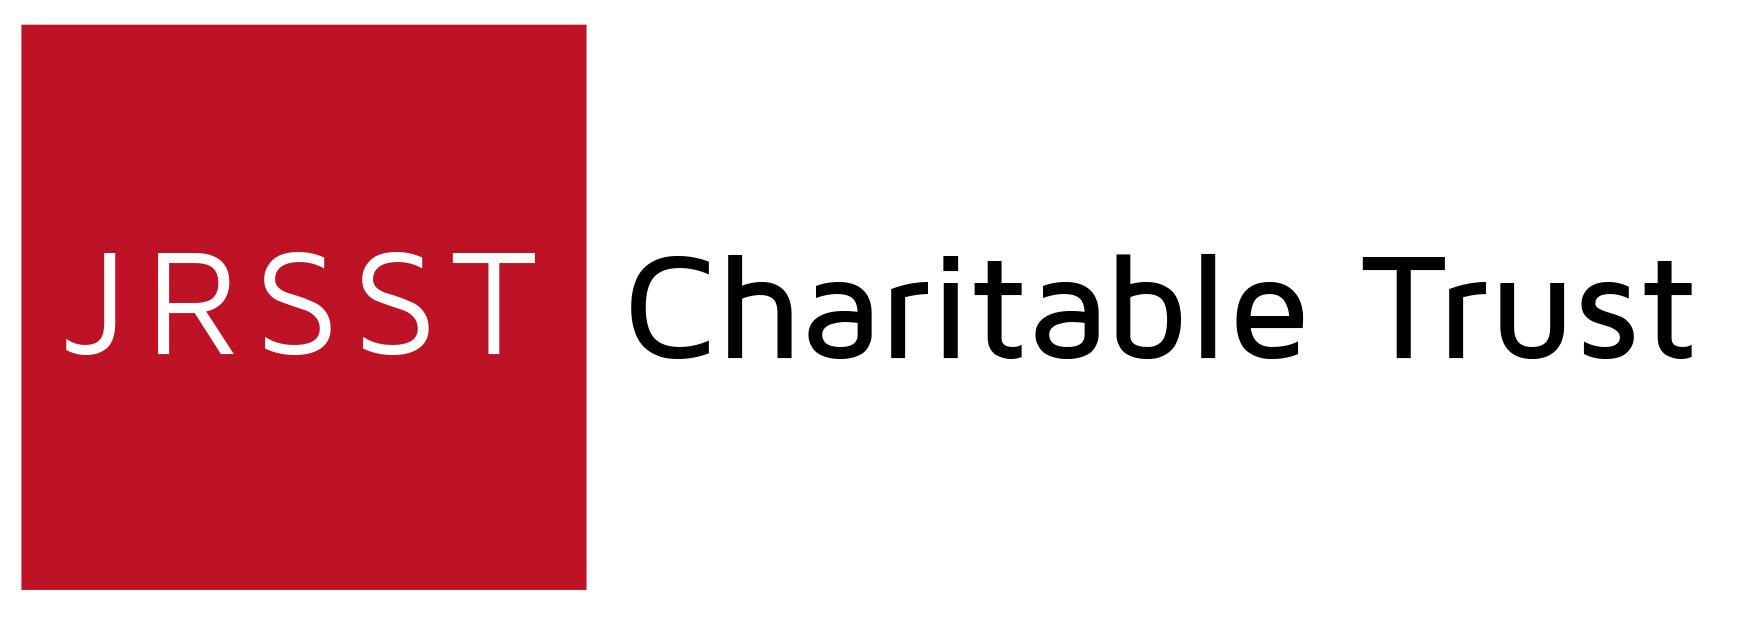 JRSST Charitable Trust logo